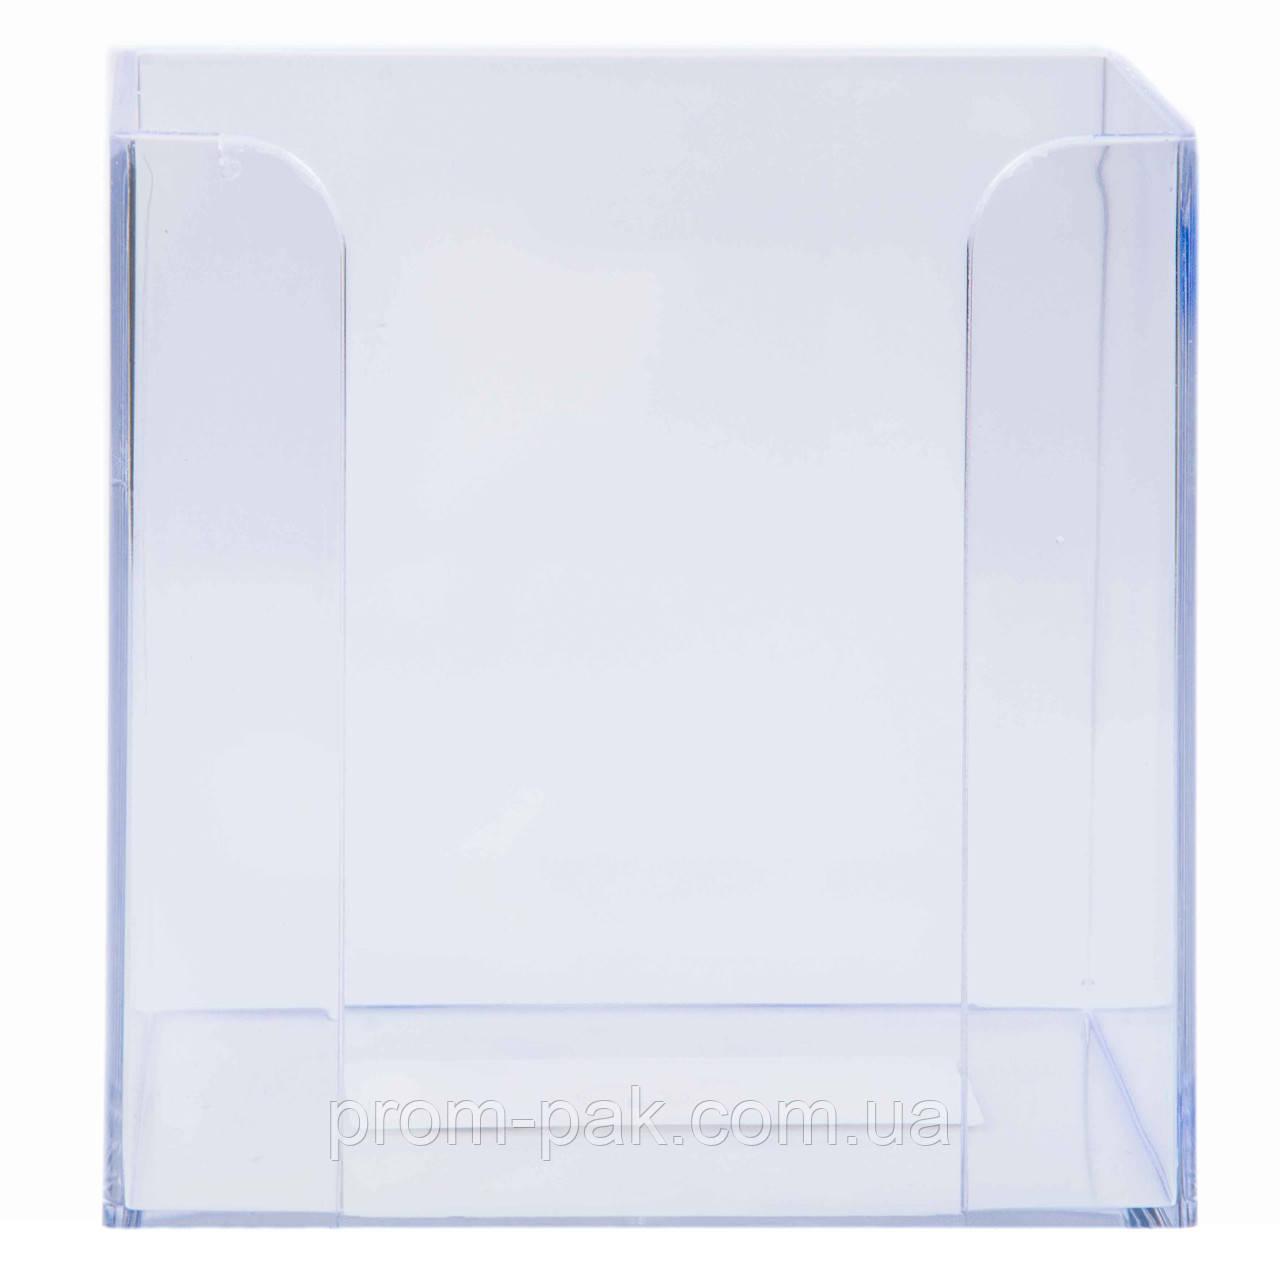 Куб без бумаг прозрачный